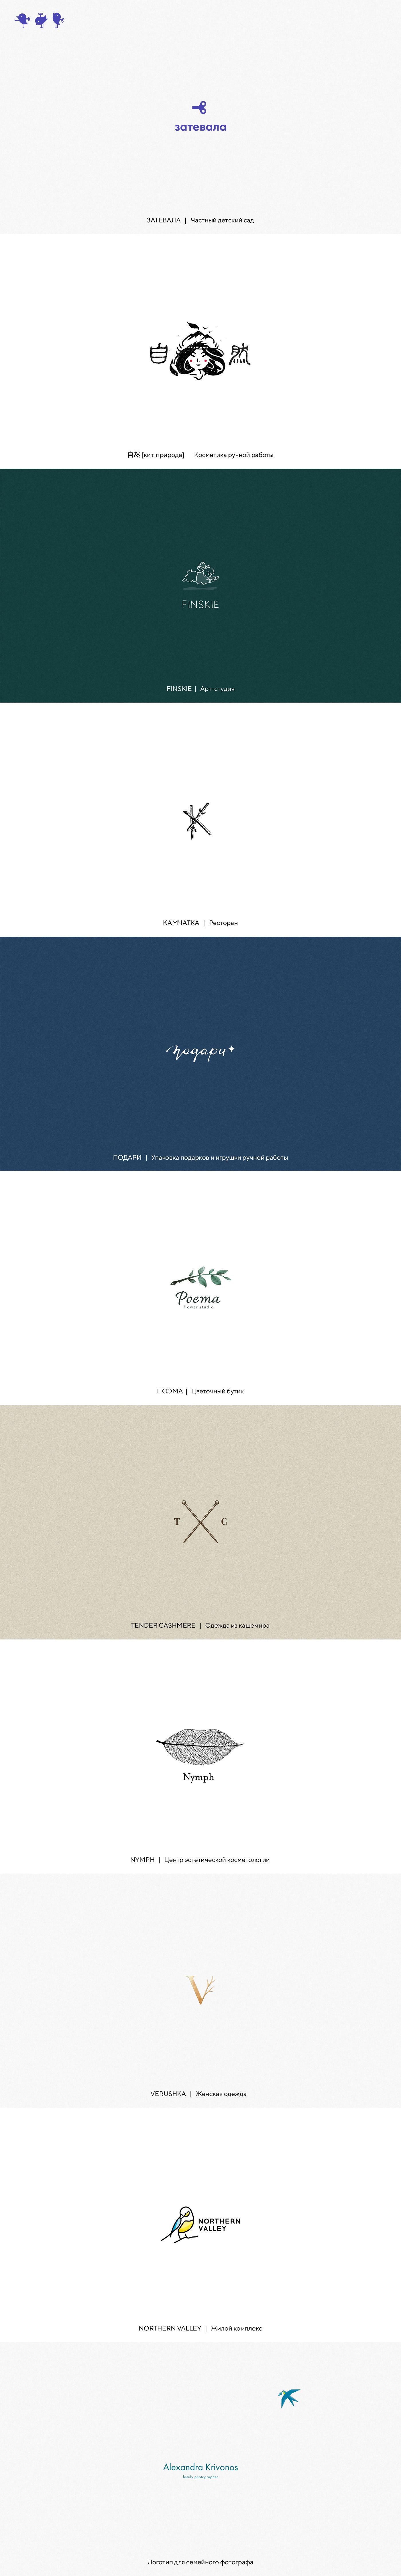 Подборка логотипов №2